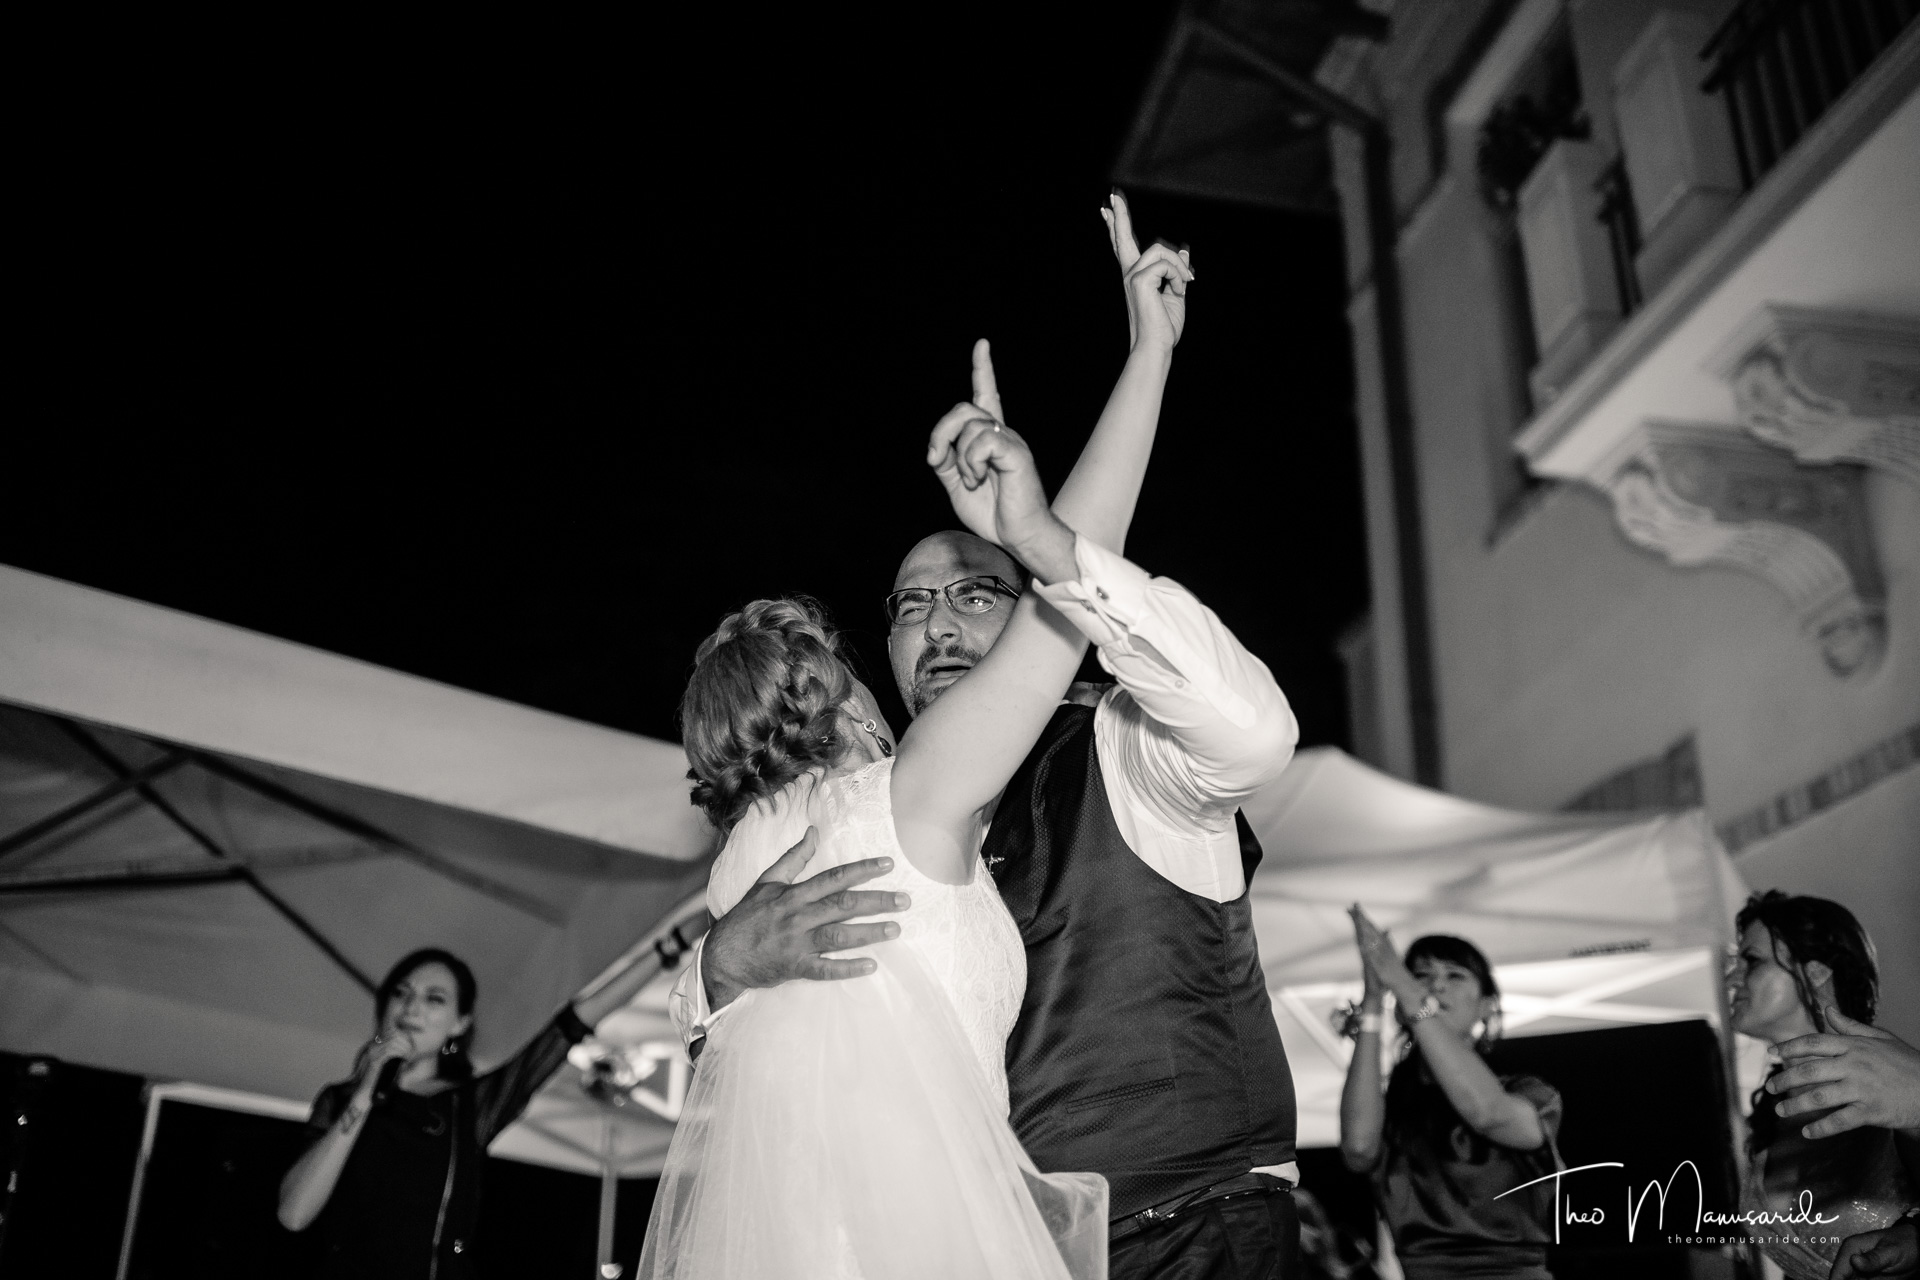 fotograf-nunta-domeniul-manasia-47